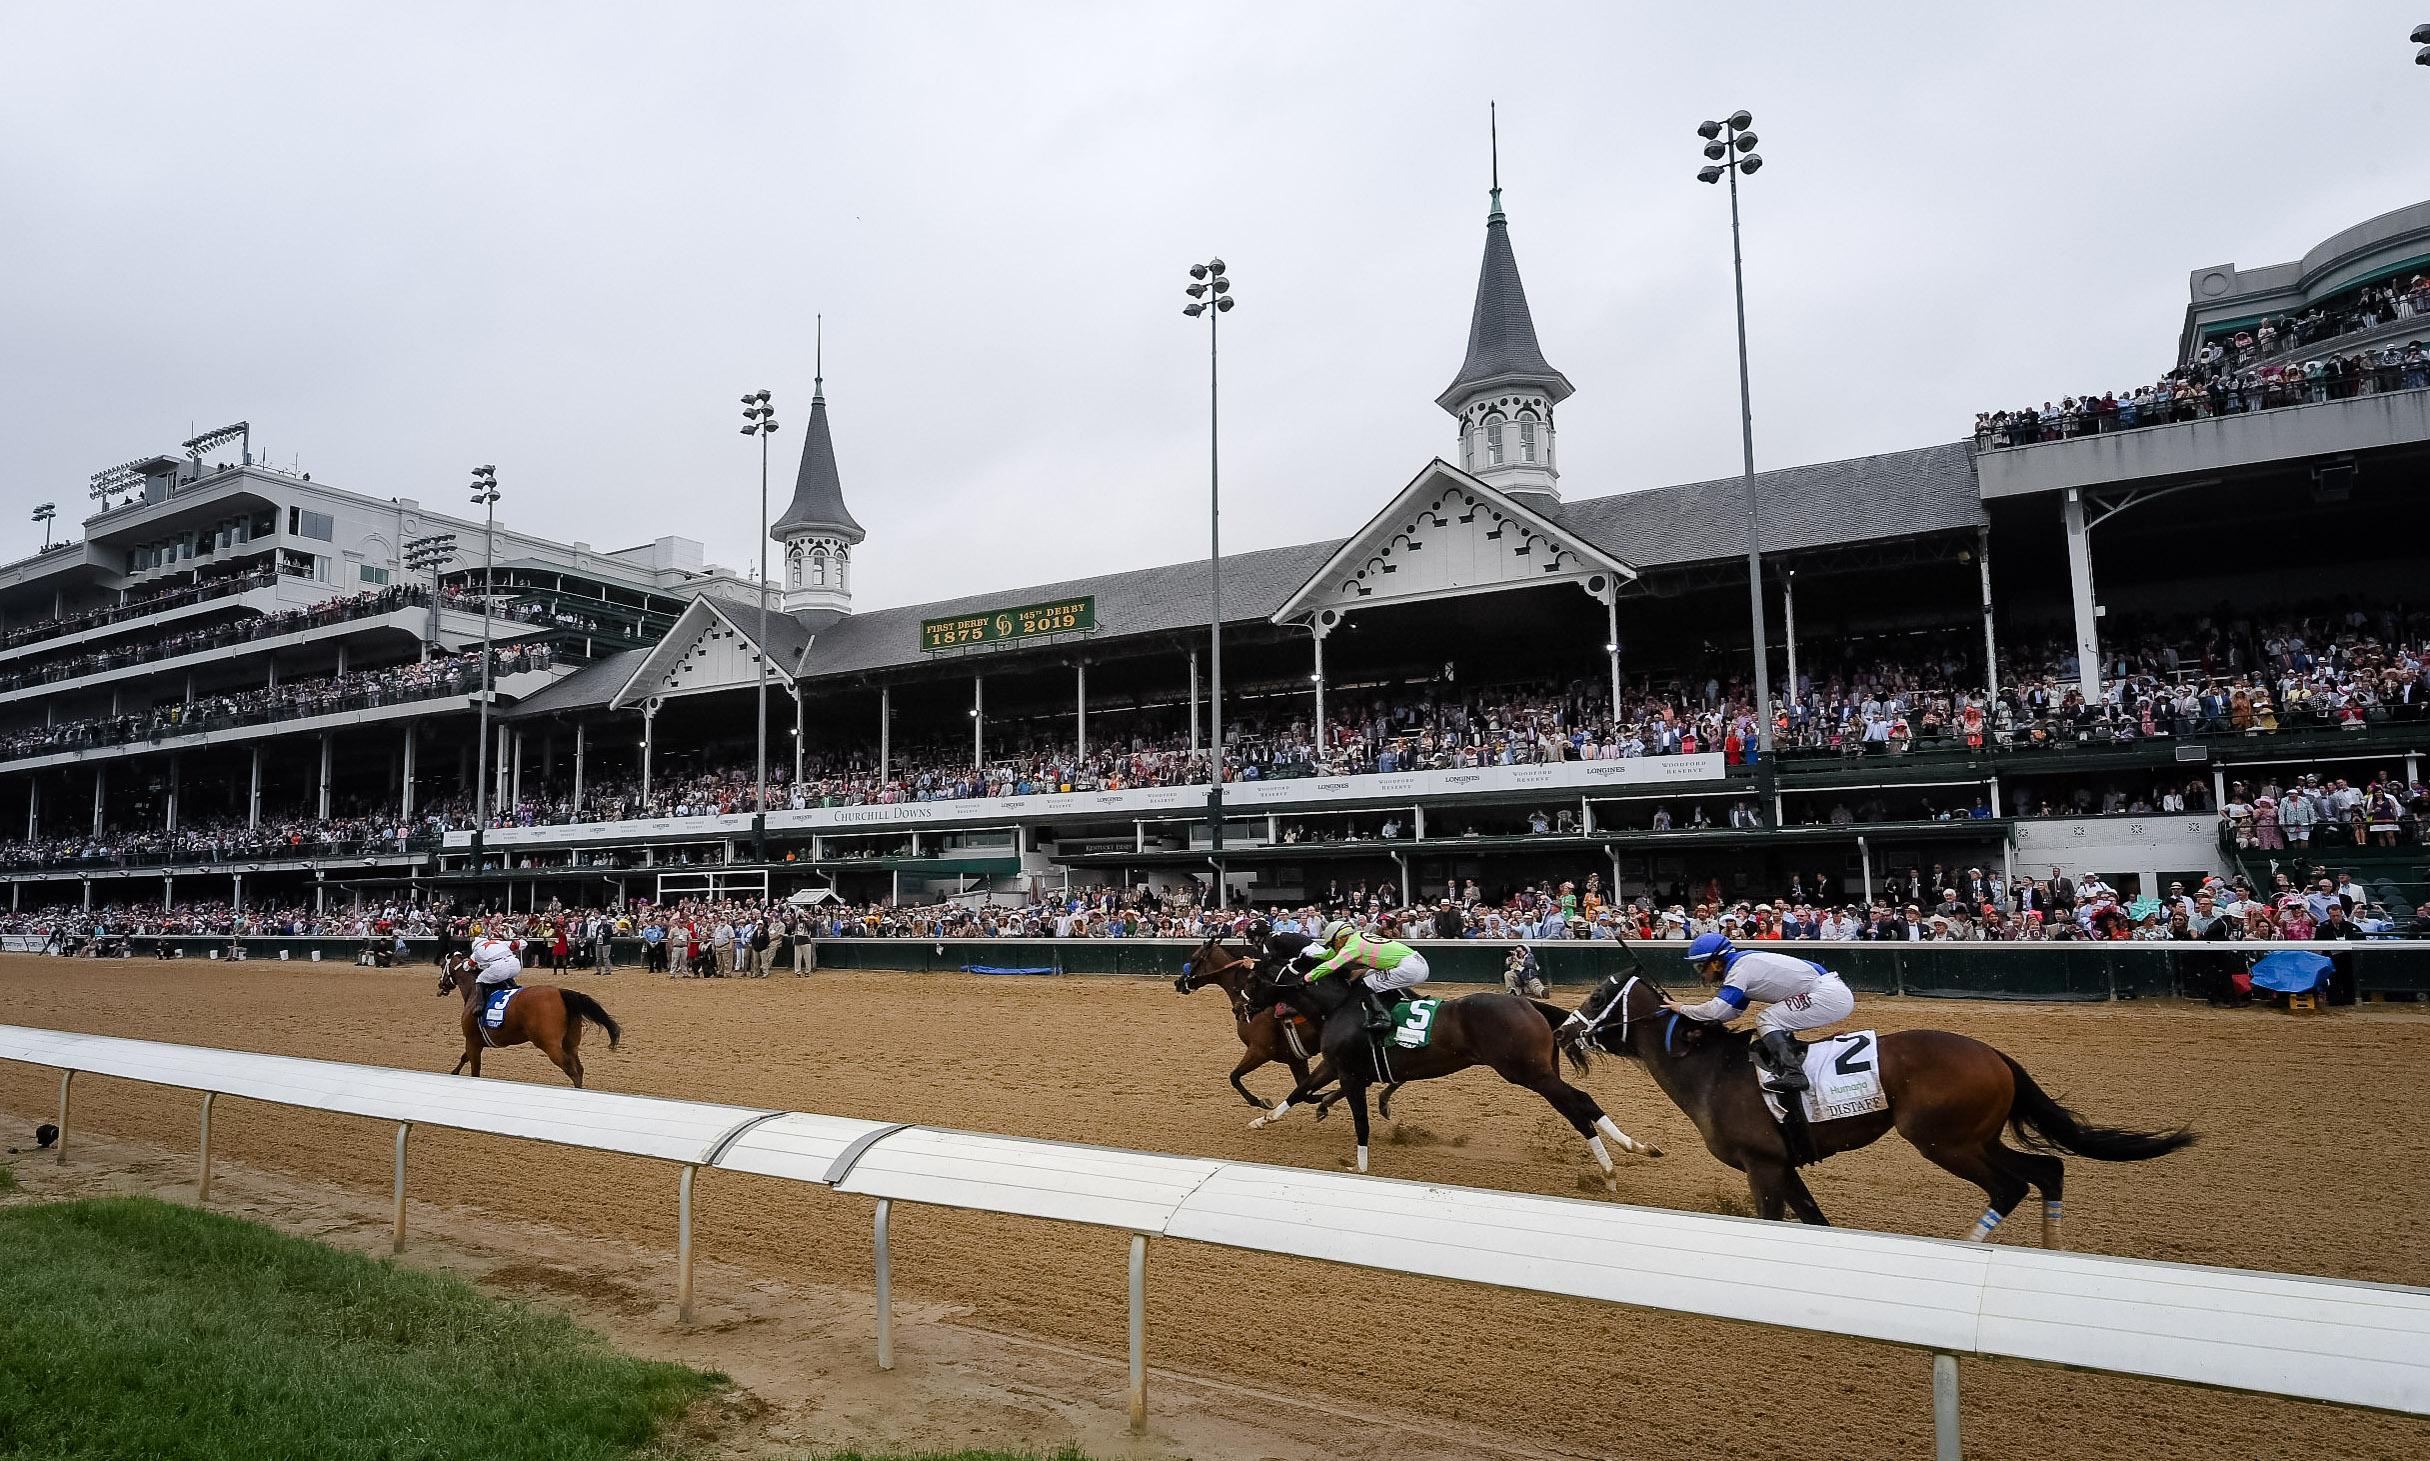 Kentucky Derby 2019_0504-14